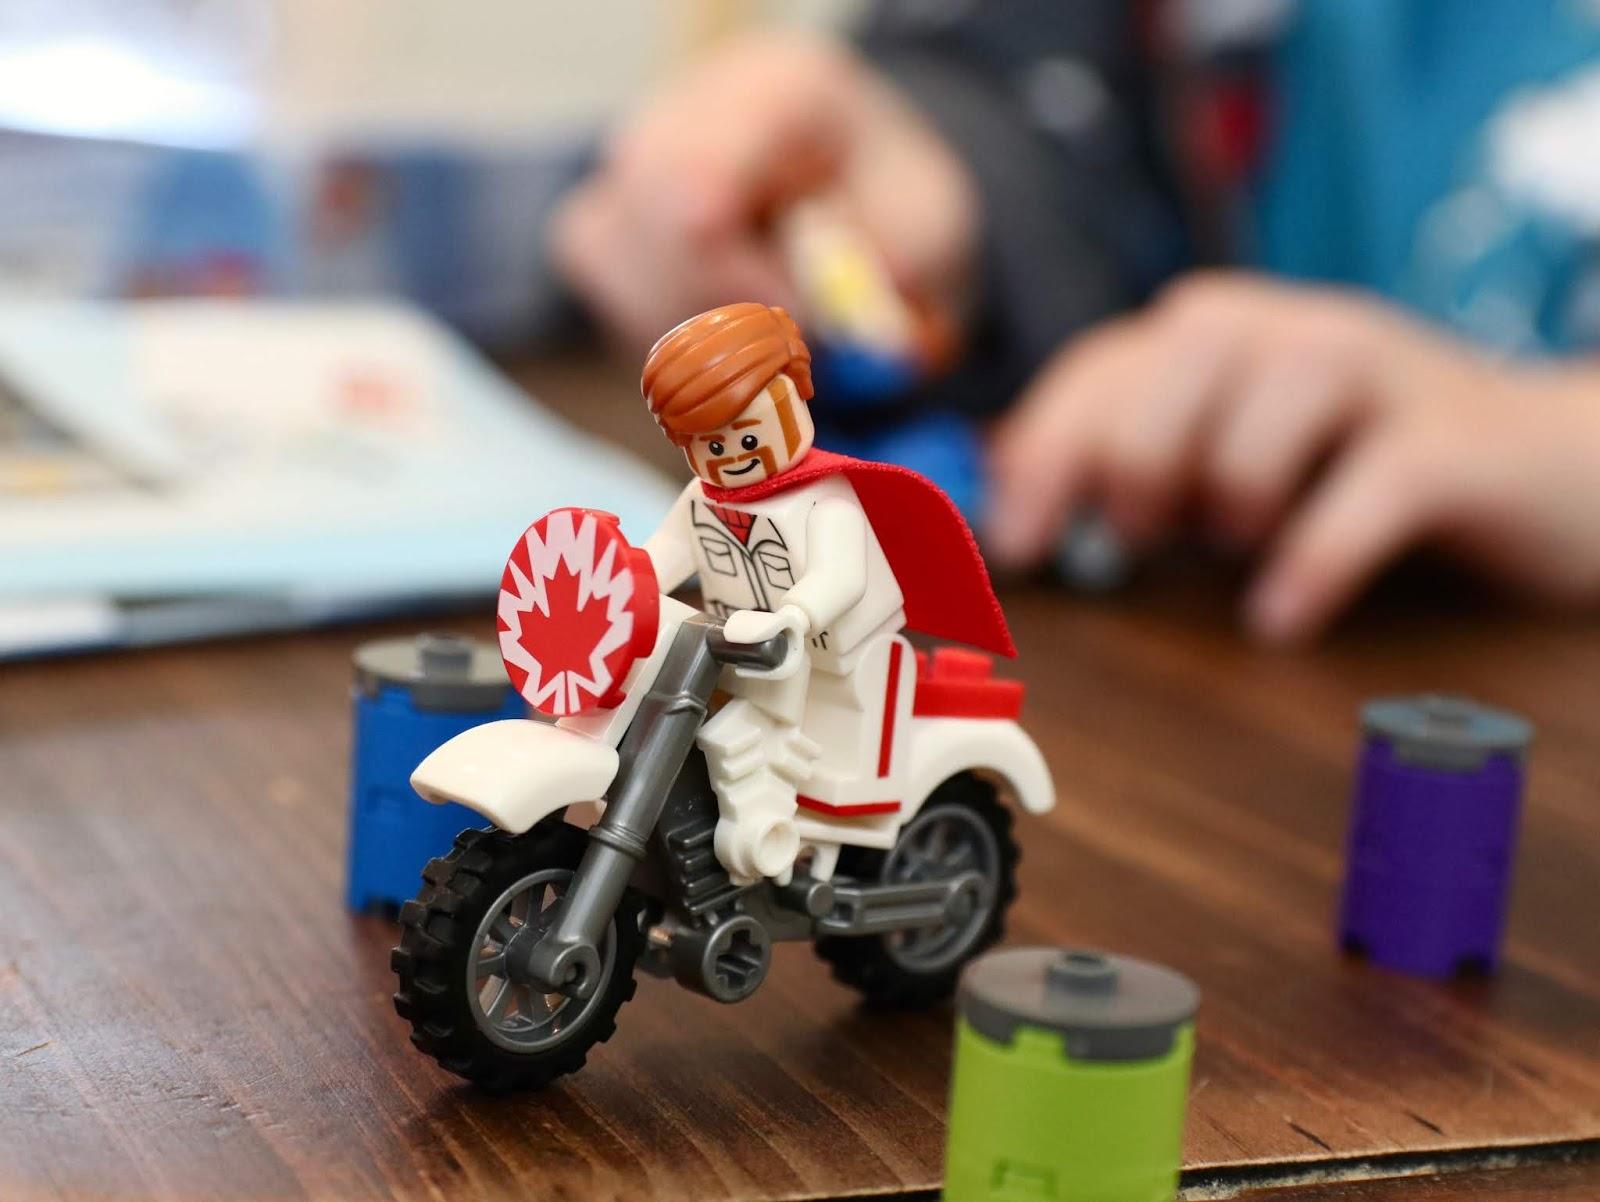 toy story 4 lego duke caboom stunt show